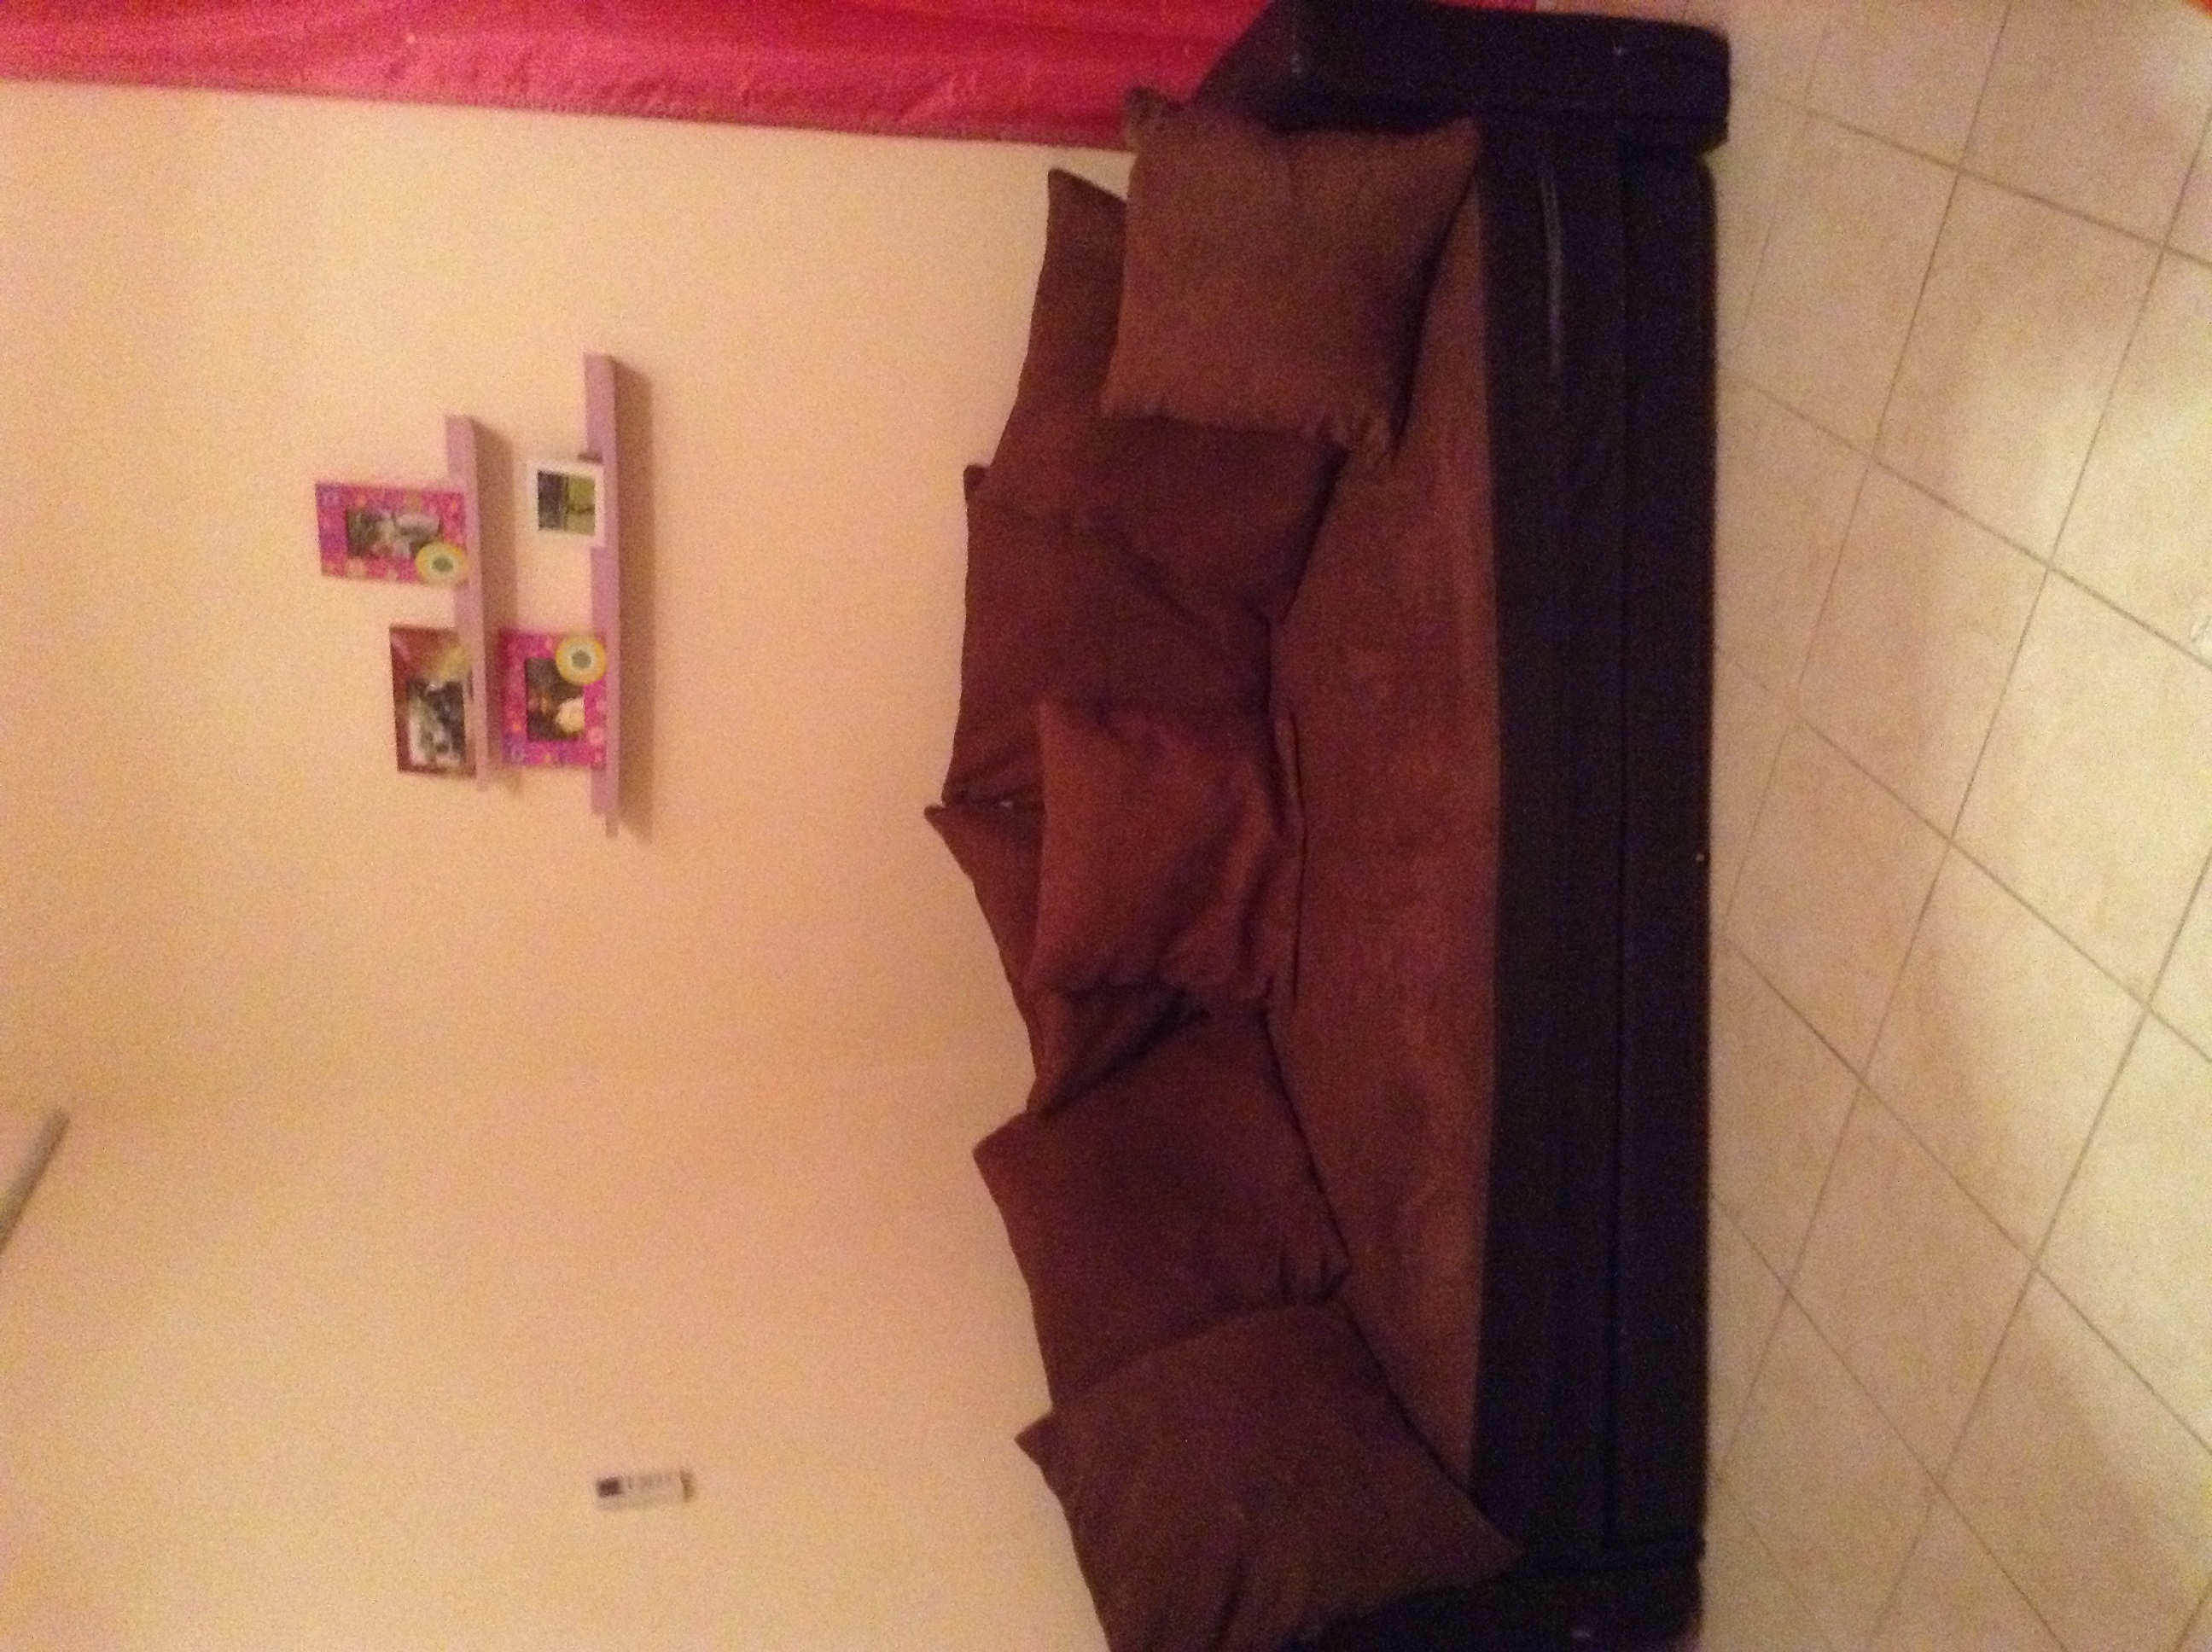 Astounding Sofa Bed From Homes R Us Qatar Living Download Free Architecture Designs Intelgarnamadebymaigaardcom